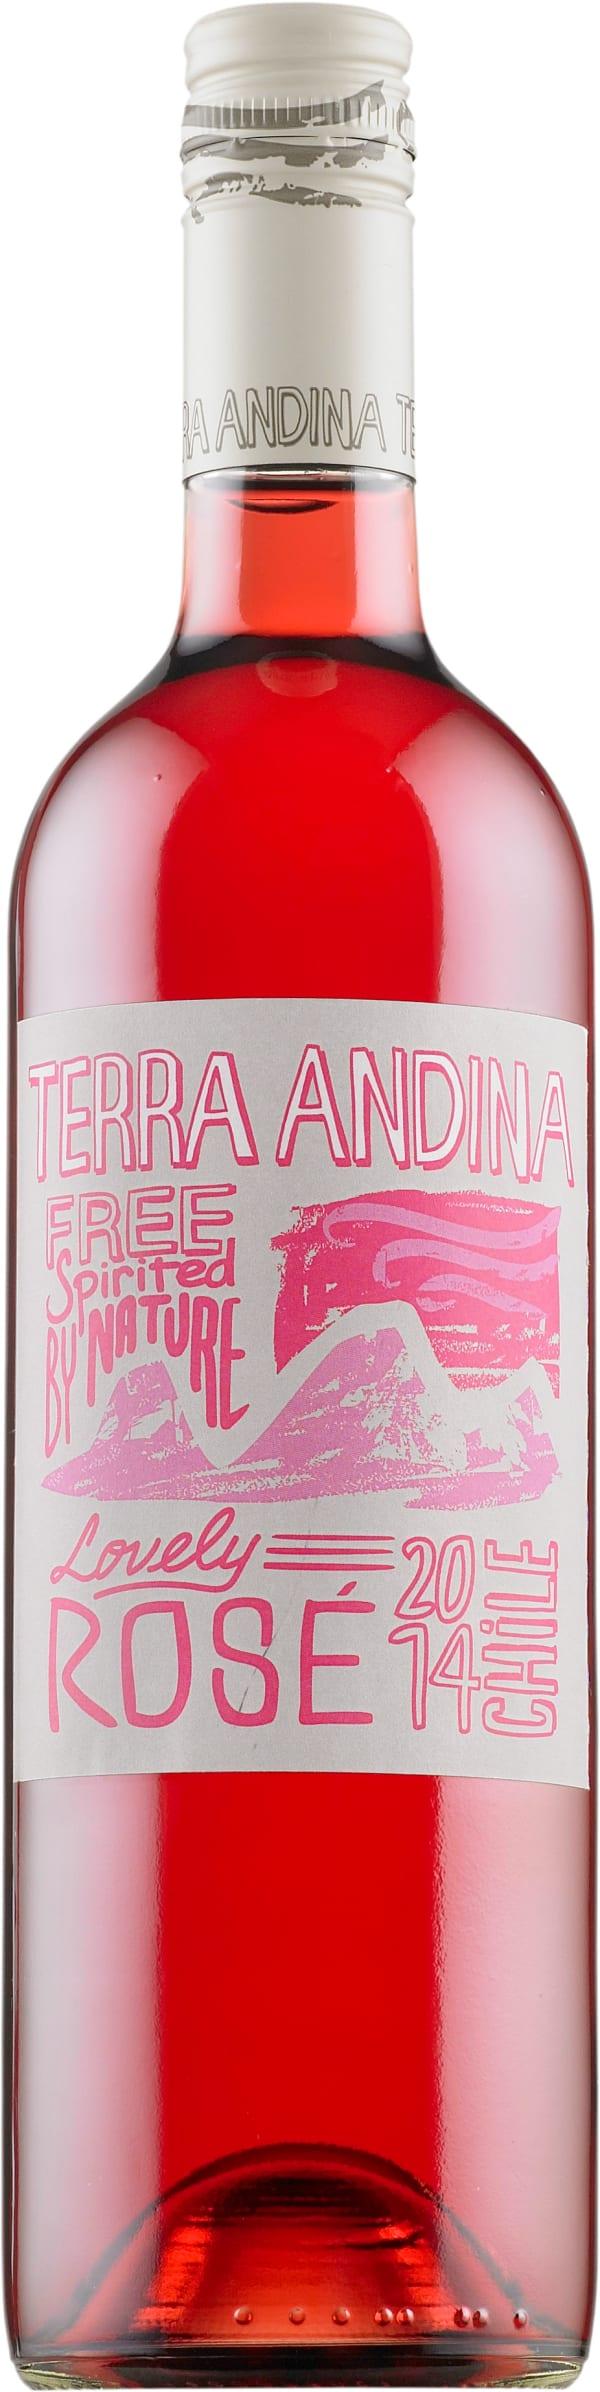 Terra Andina Lovely Rosé 2017